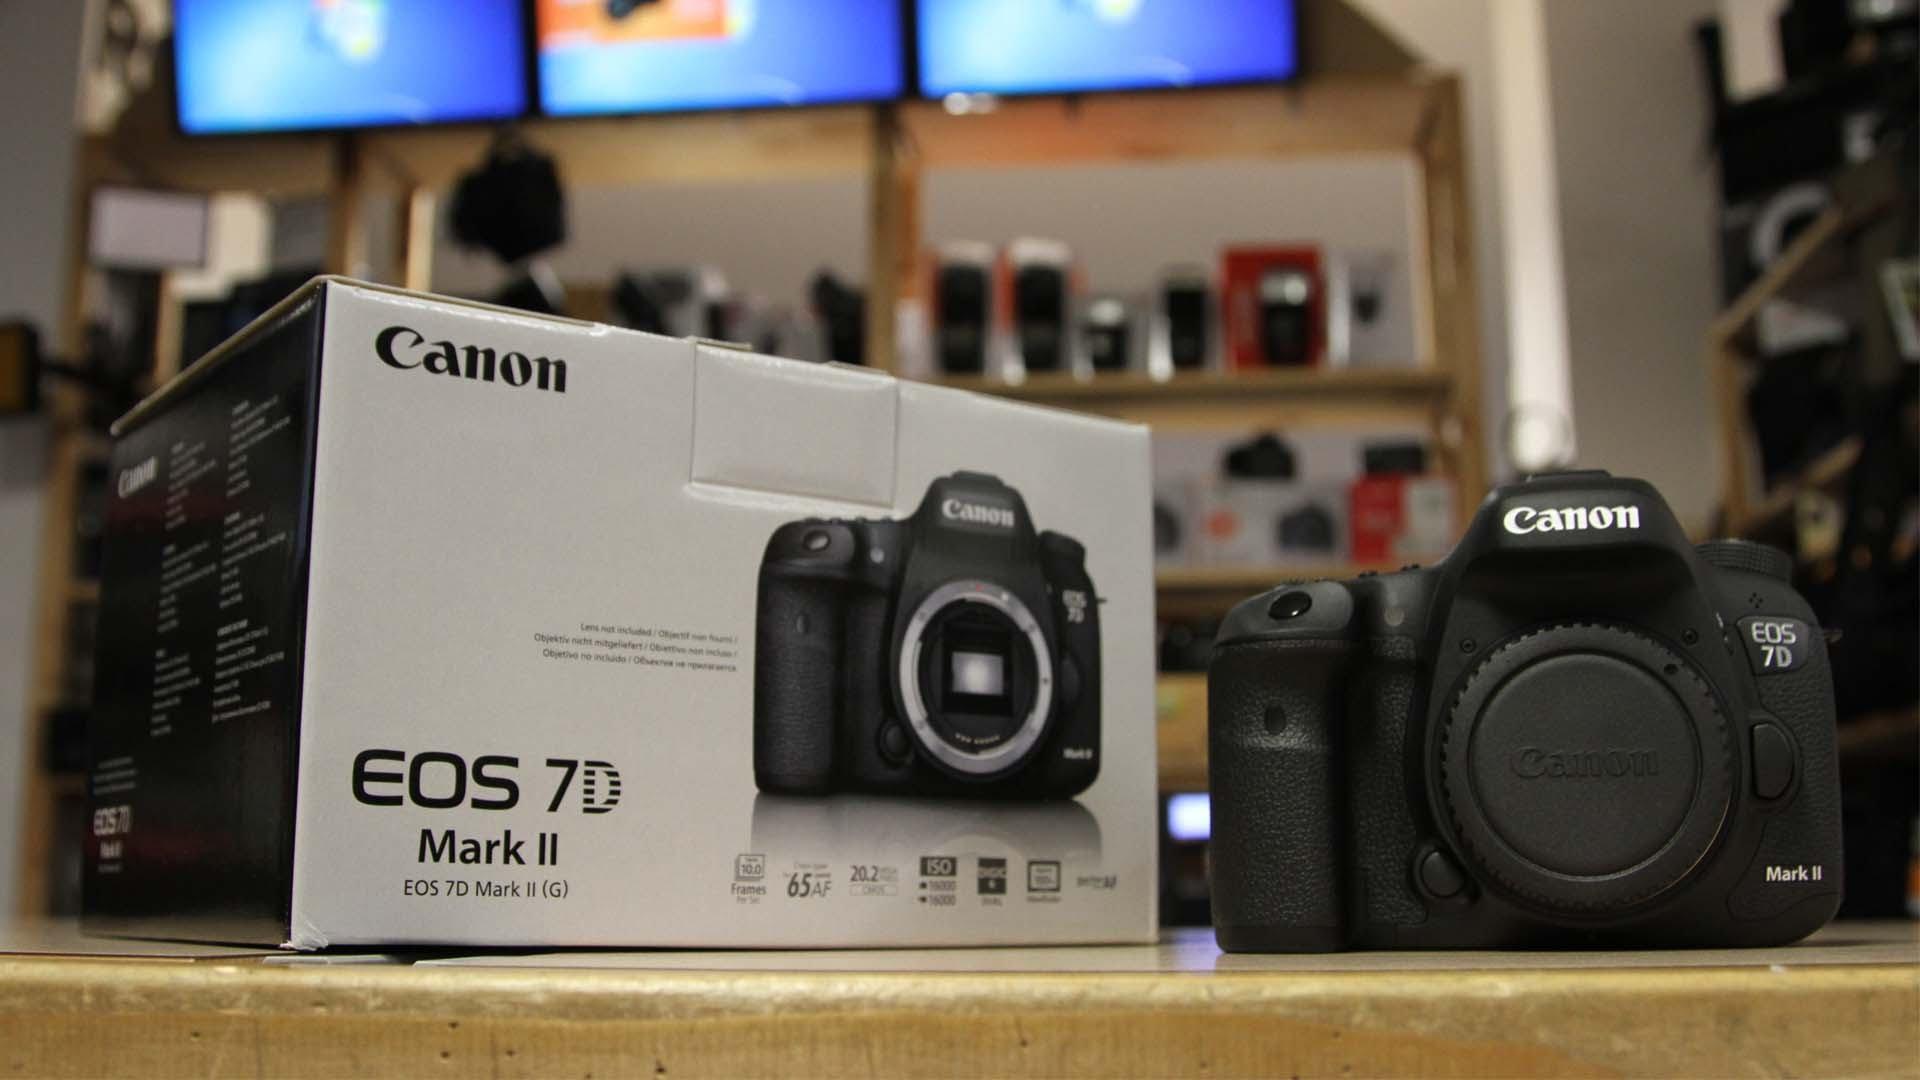 Harga Kamera Canon Eos 7d Mark Ii Archidev Body W E1 Wifi Garansi Resmi